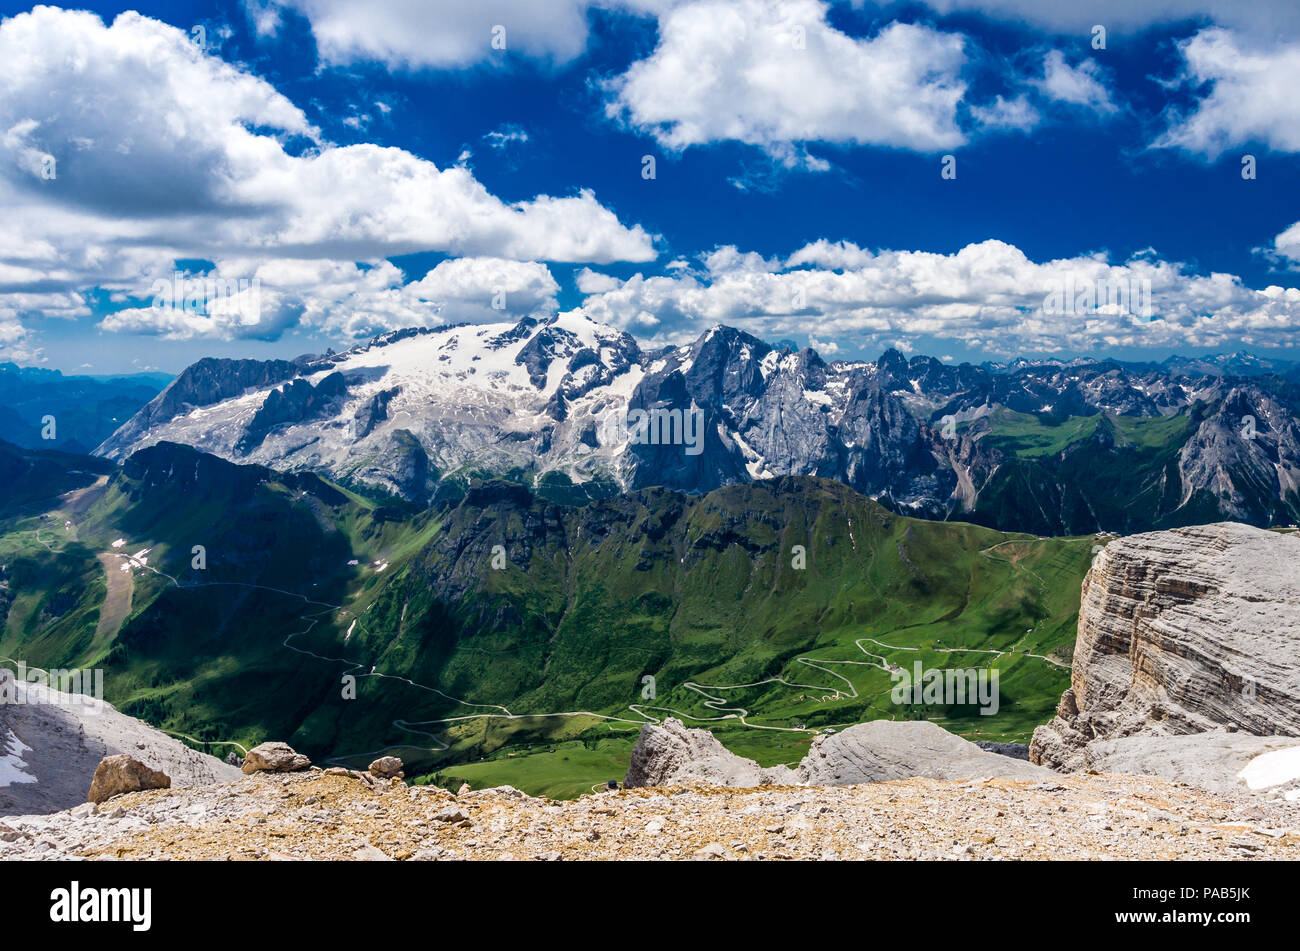 Marmolada massif, Dolomiti, Itay. Beautiful view over the Marmolada glacier and Pordoi Pass from gruppo Sella and Piz Boe peak - Stock Image